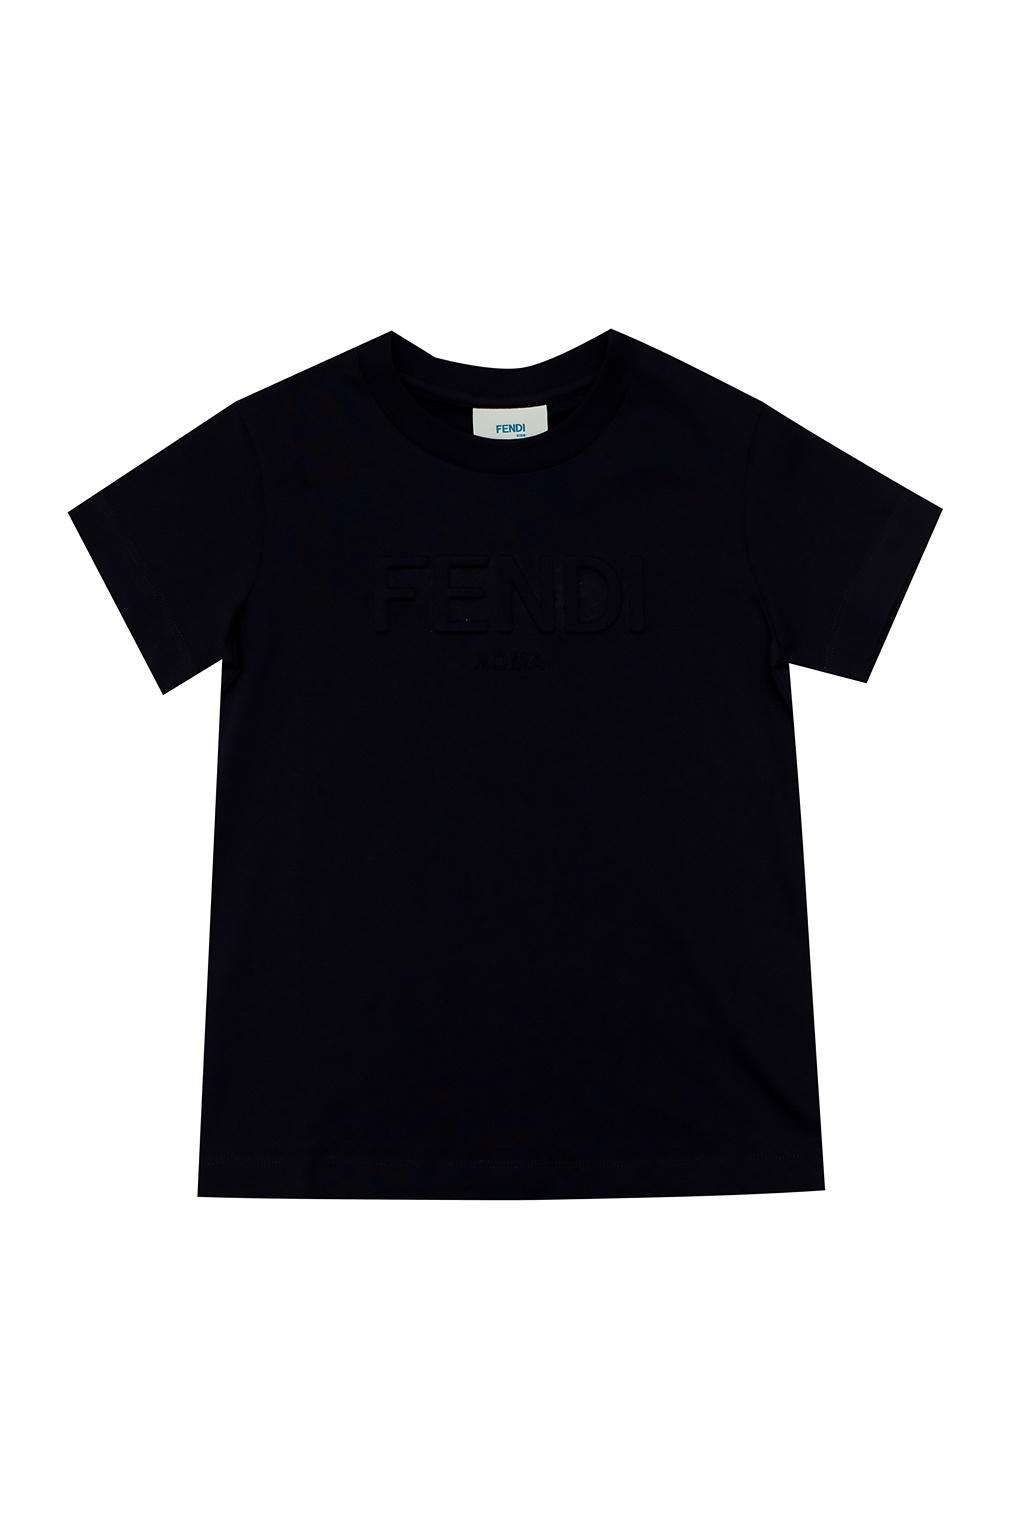 Fendi Kids T-shirt with logo